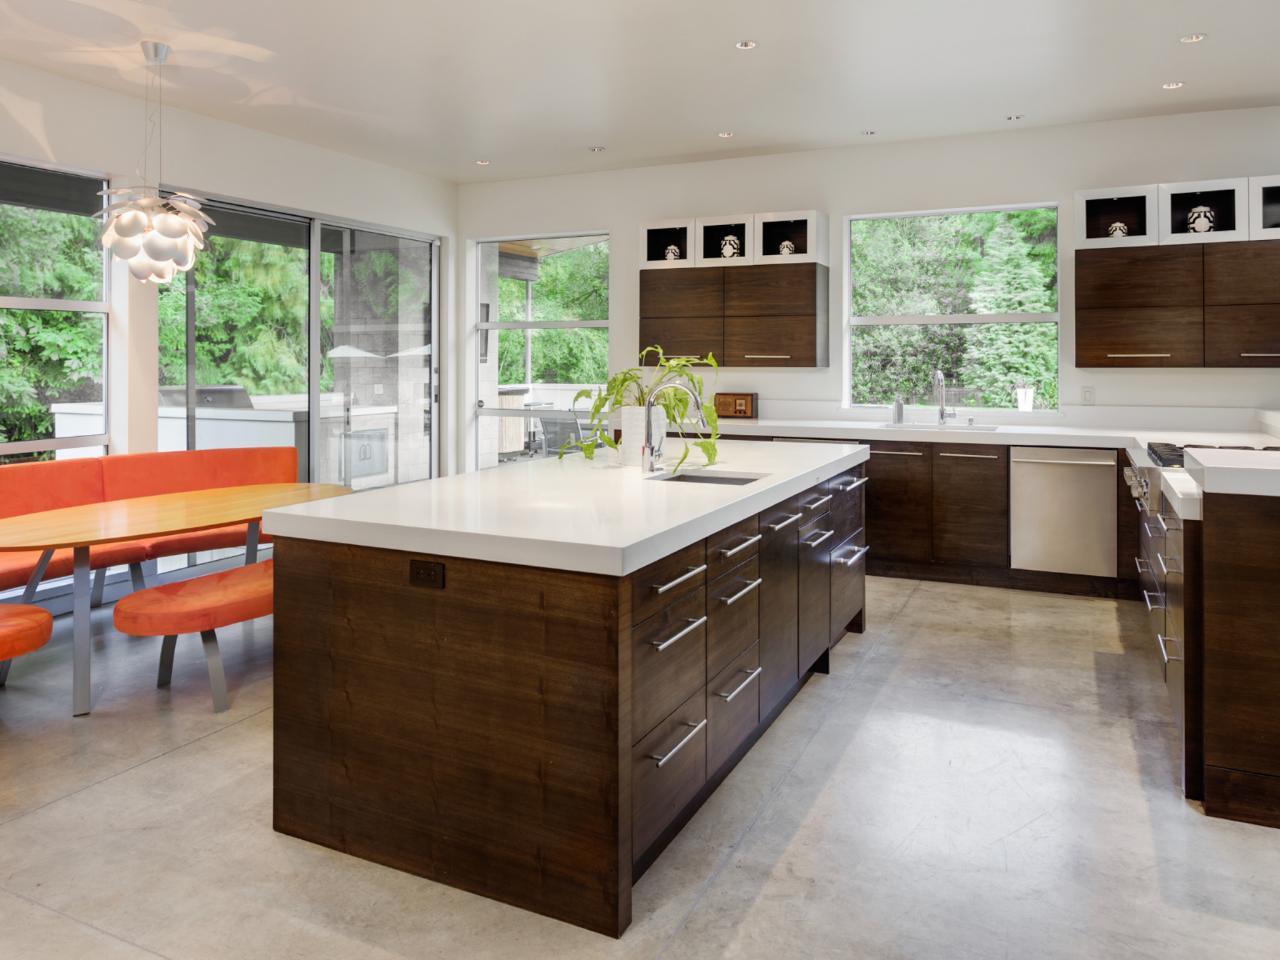 best flooring ideas the best kitchen flooring options AXFJJLP